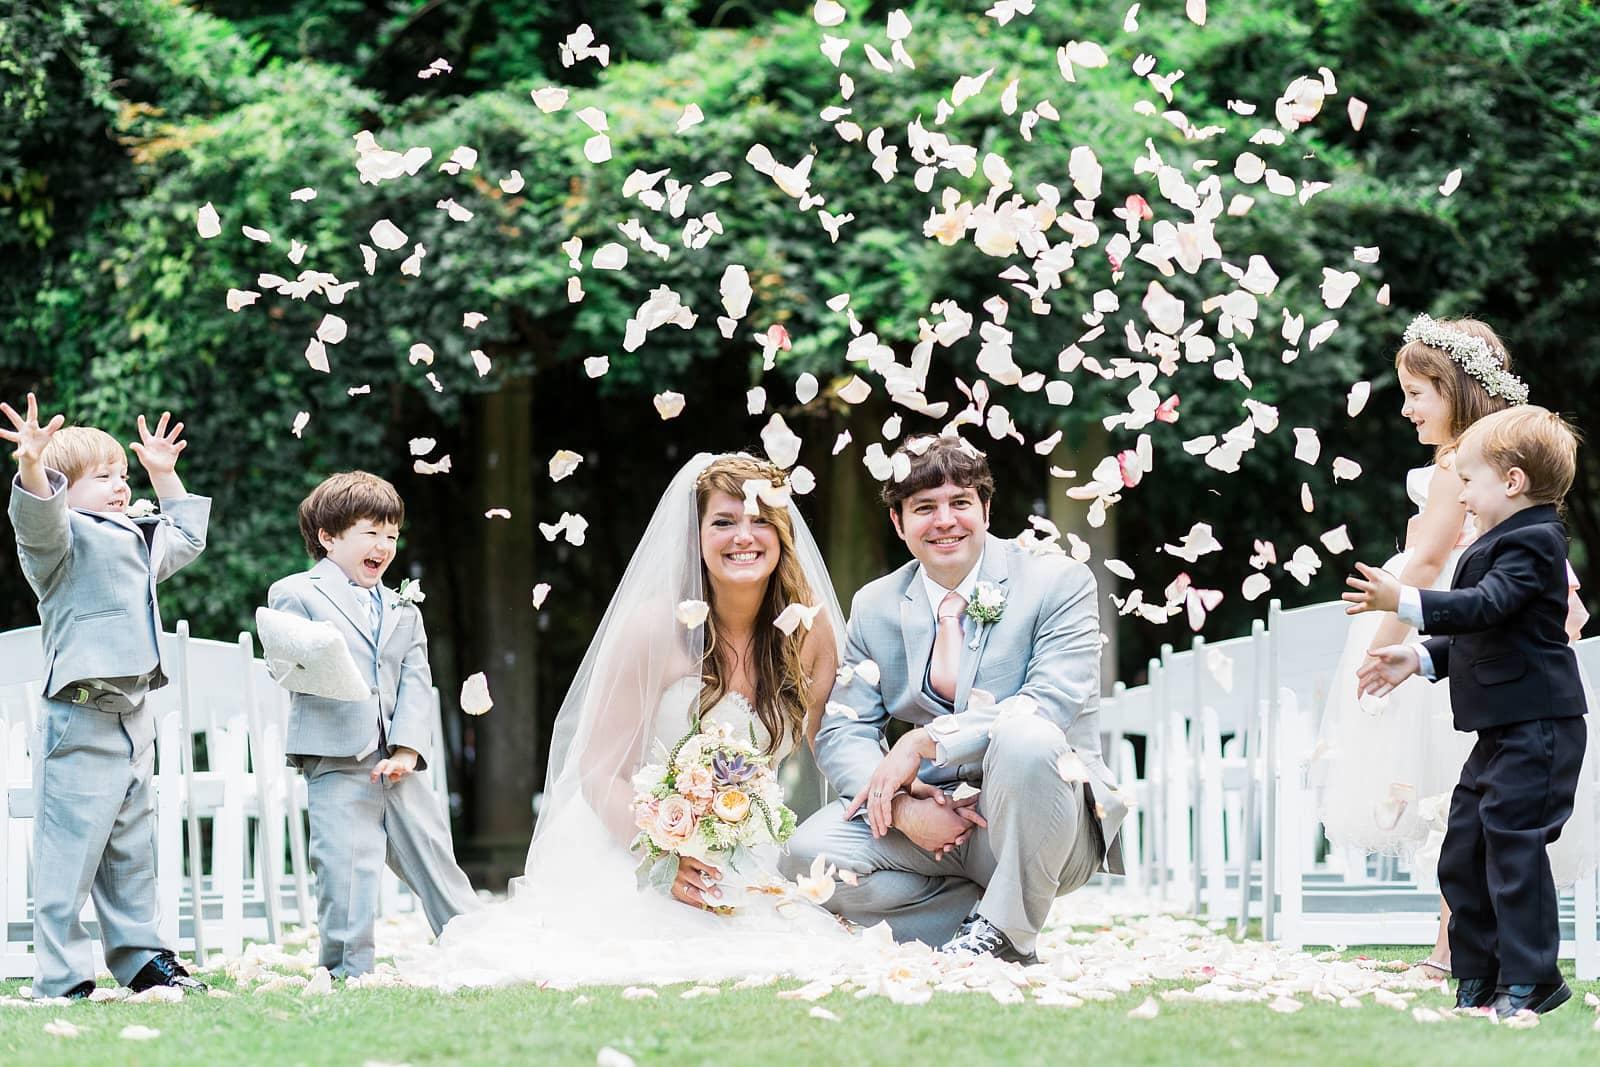 kids throw flowers over bride and groom Cator Wooldford Gardens